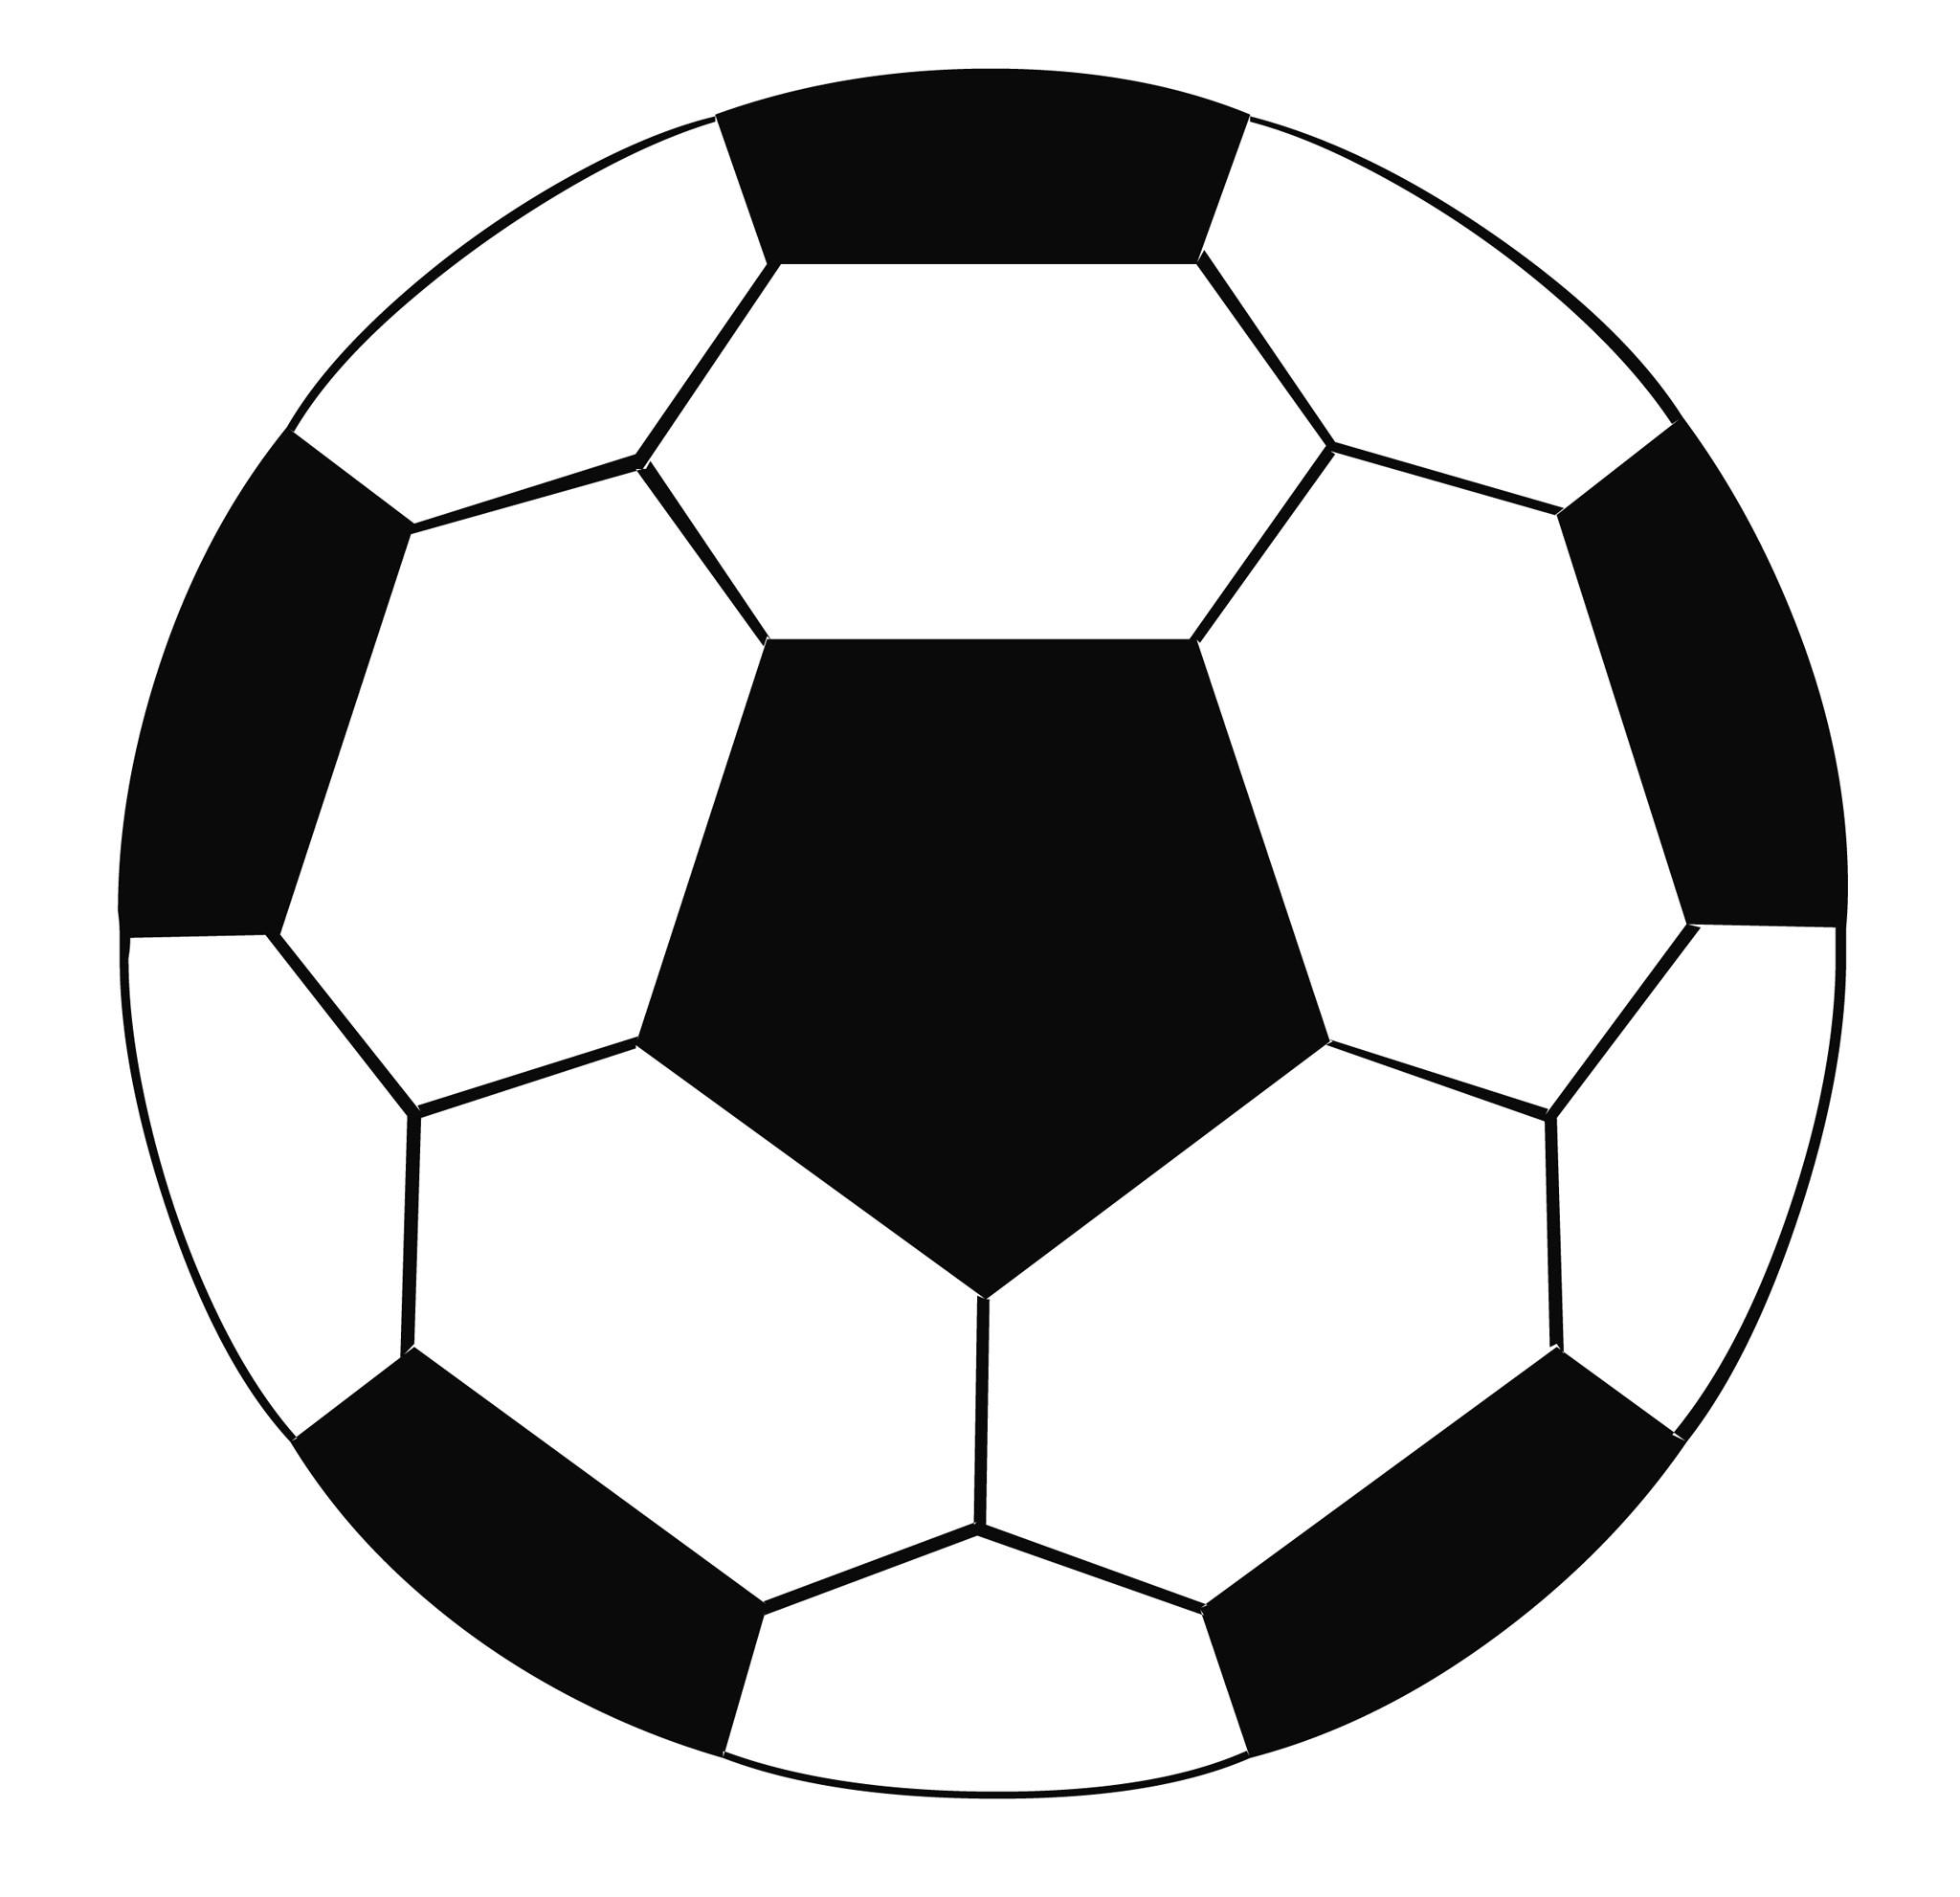 2048x1982 Soccer Ball Clip Art Sports Image